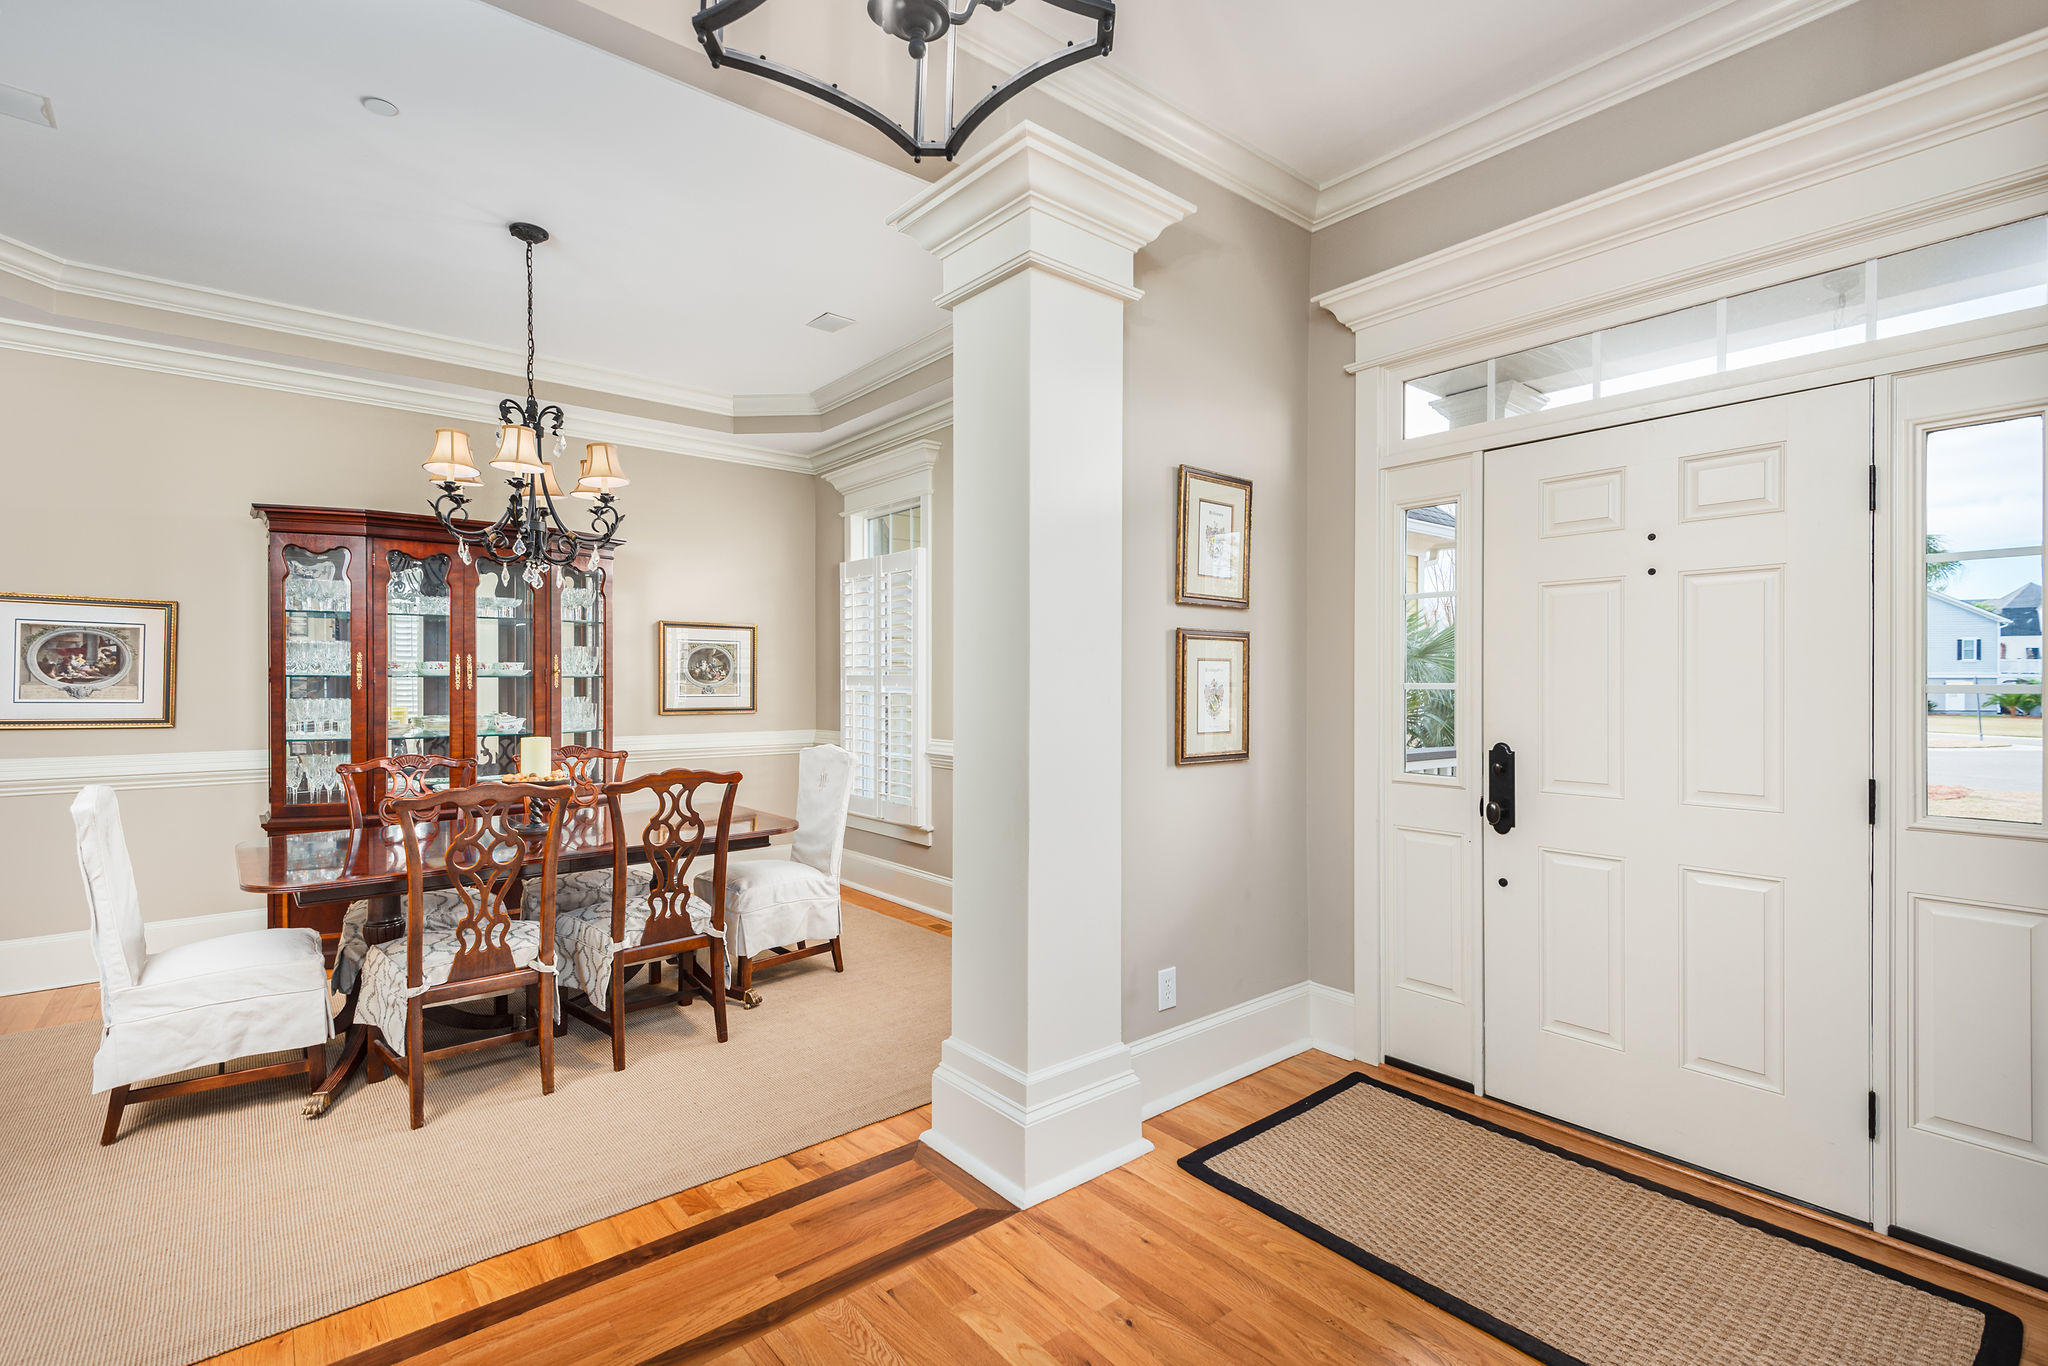 Dunes West Homes For Sale - 1305 King Bird, Mount Pleasant, SC - 43